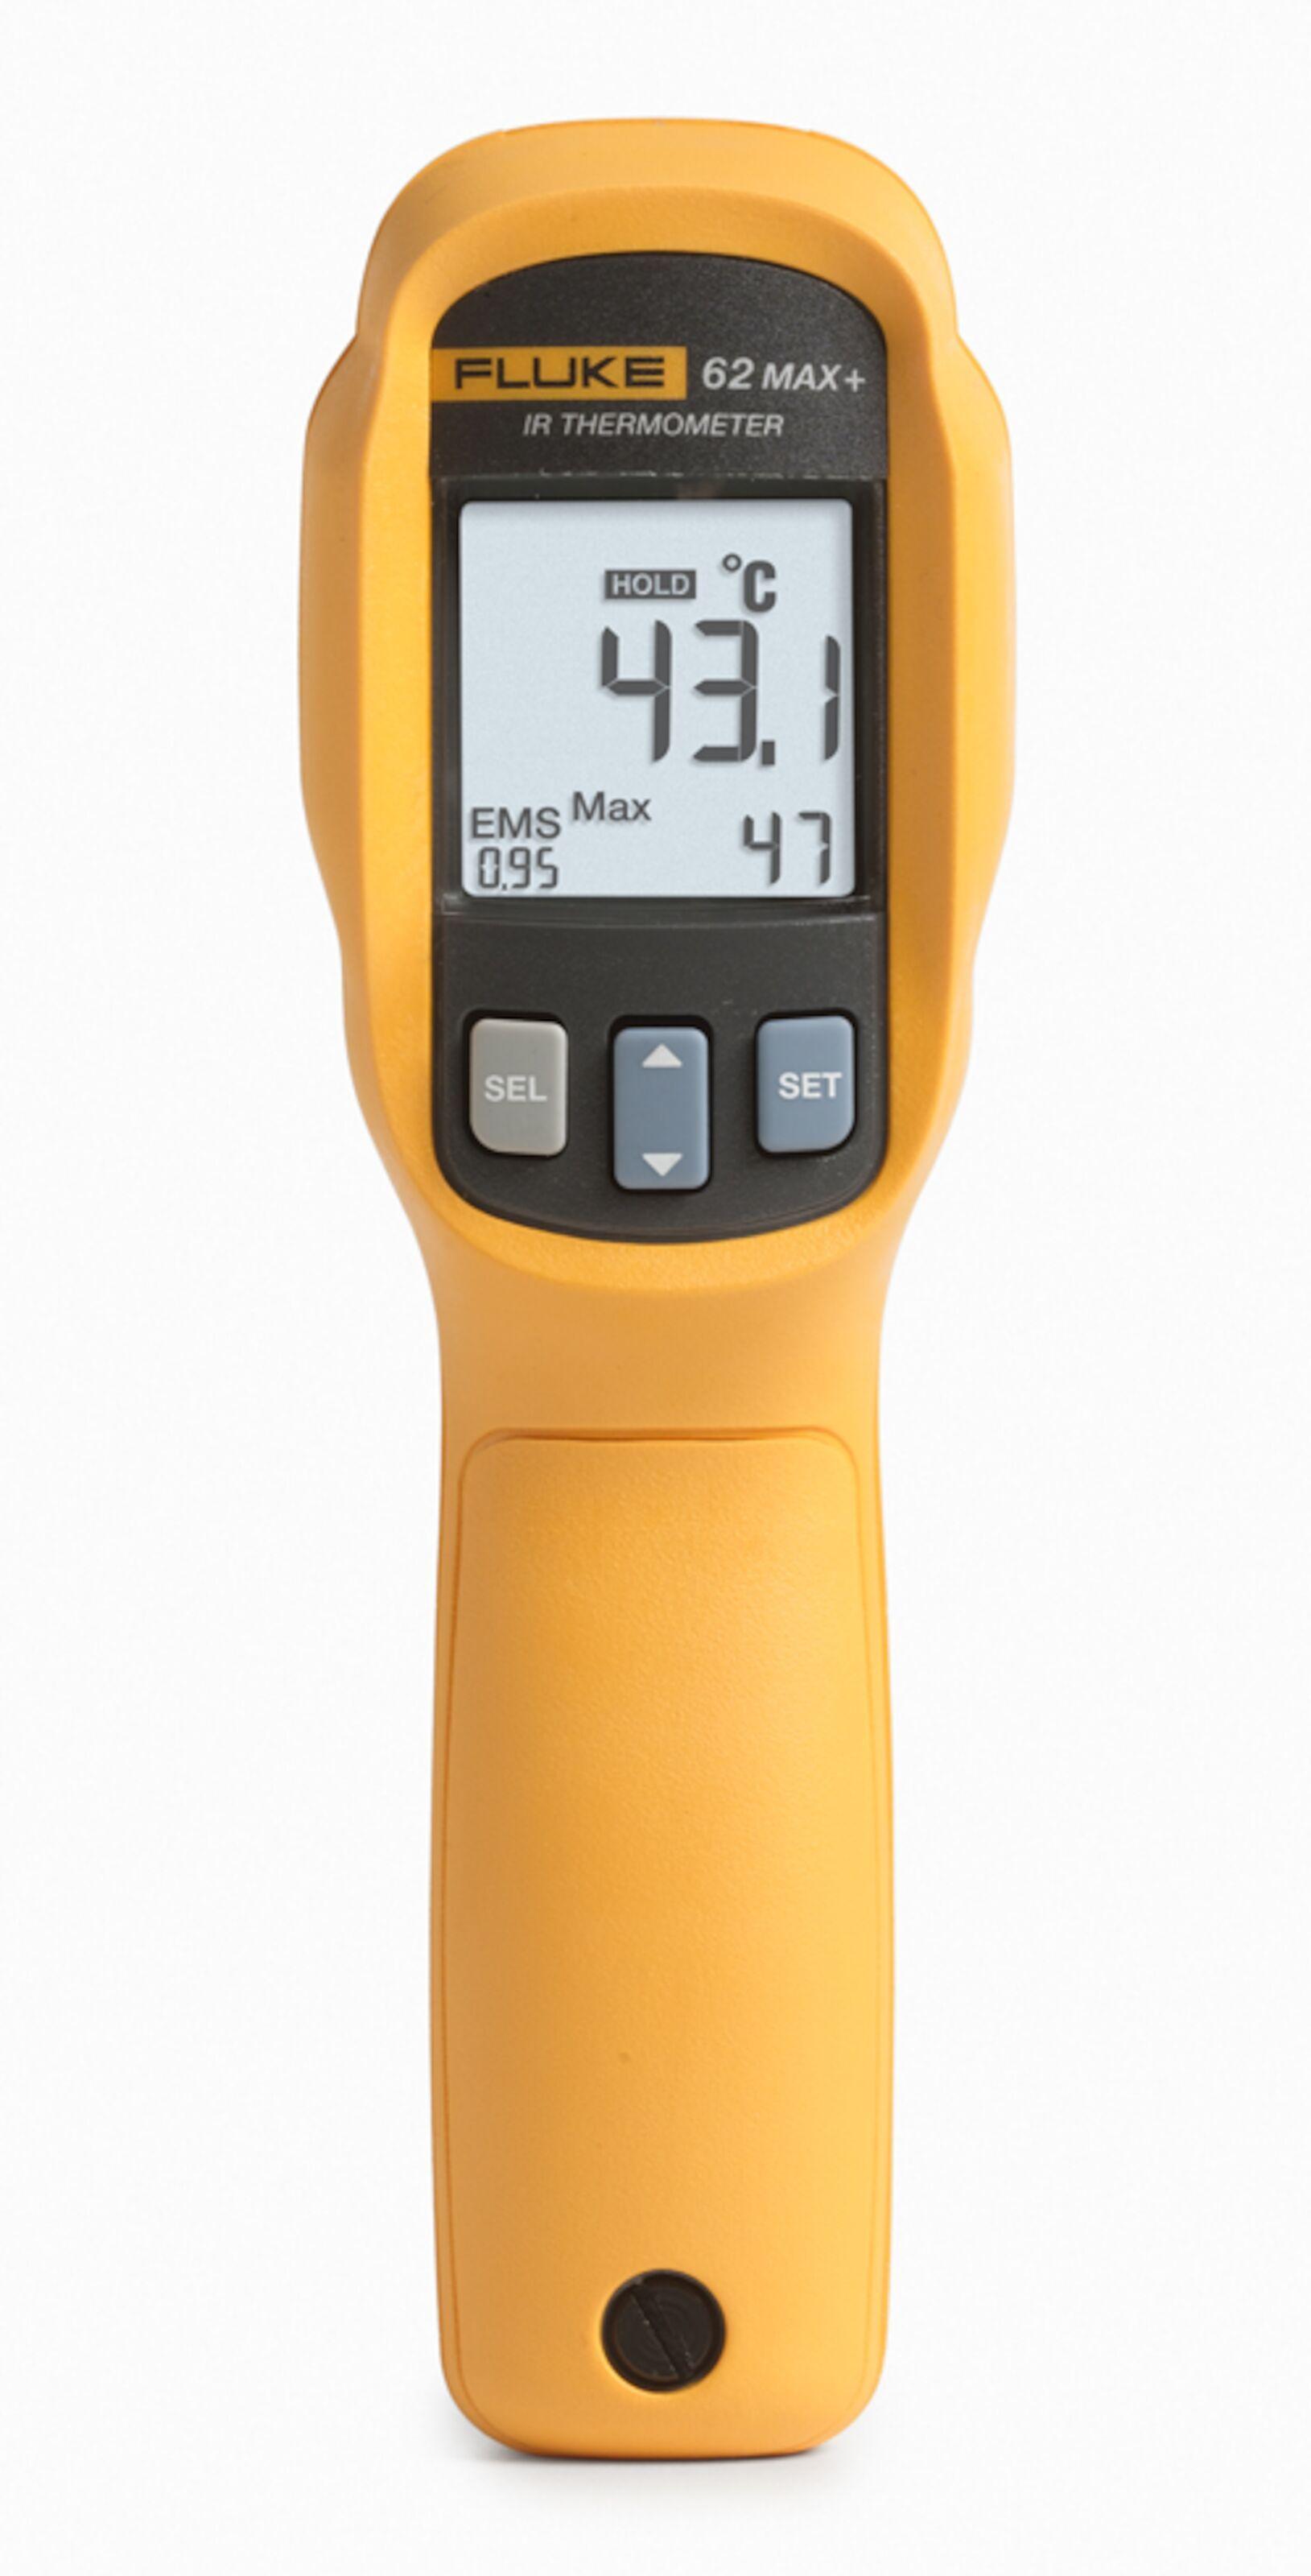 Fluke 62 Max+ IR termometer